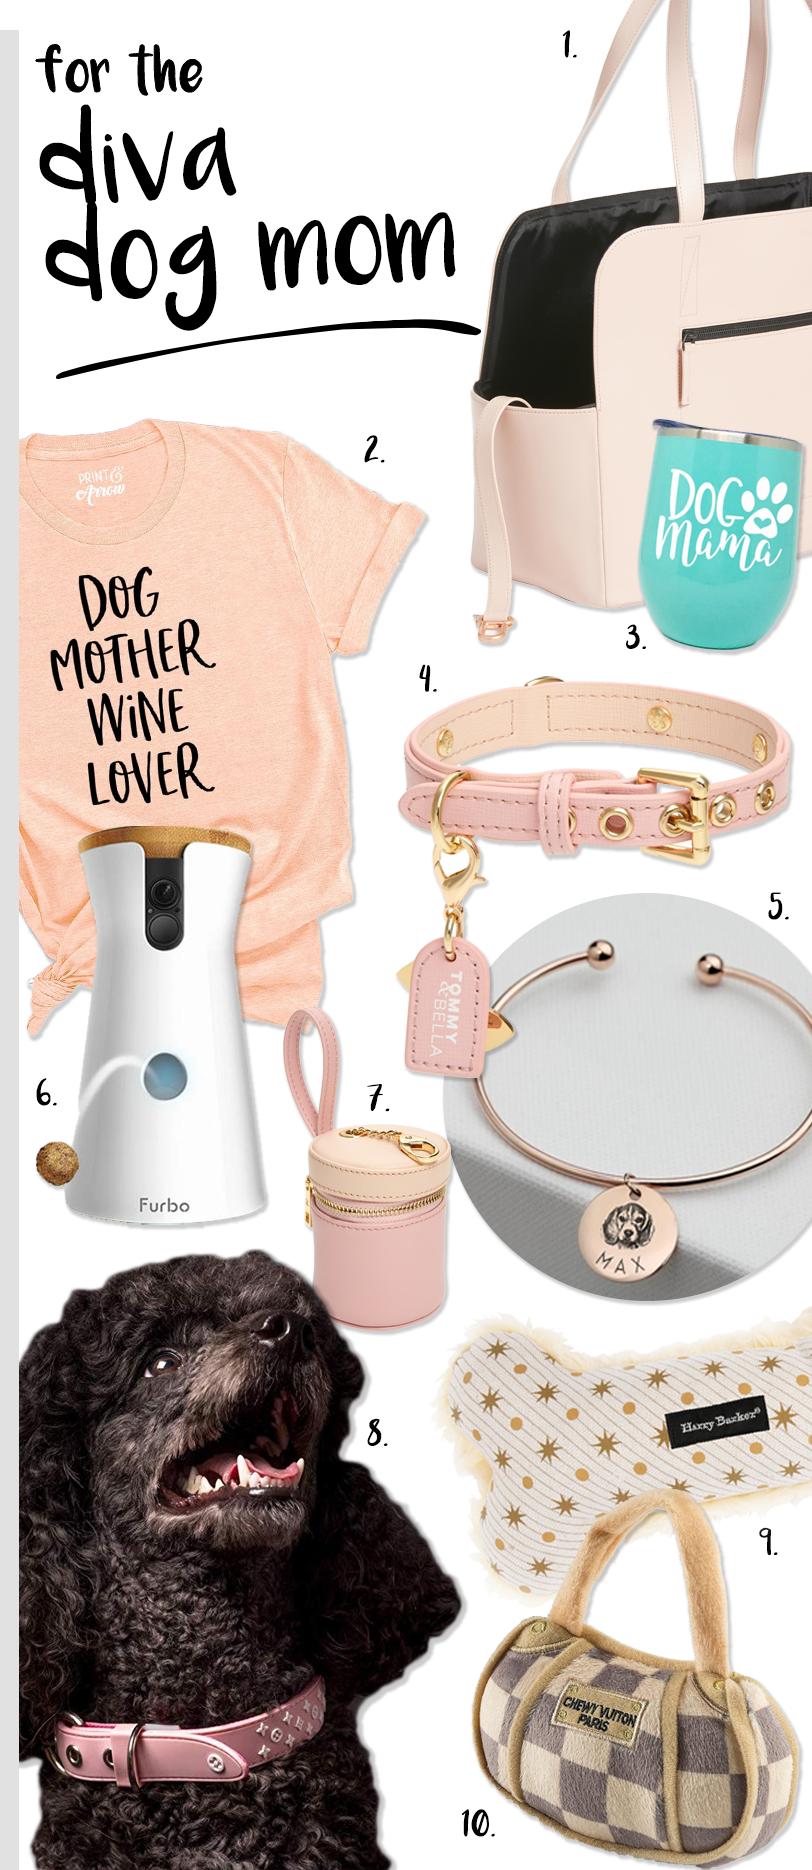 Ultimate Dog Parent Gift Guide – Gifts for 8 Types of Dog Parent! heydjangles.com - Gift ideas for the diva dog mom. #dogmomgifts #divadog